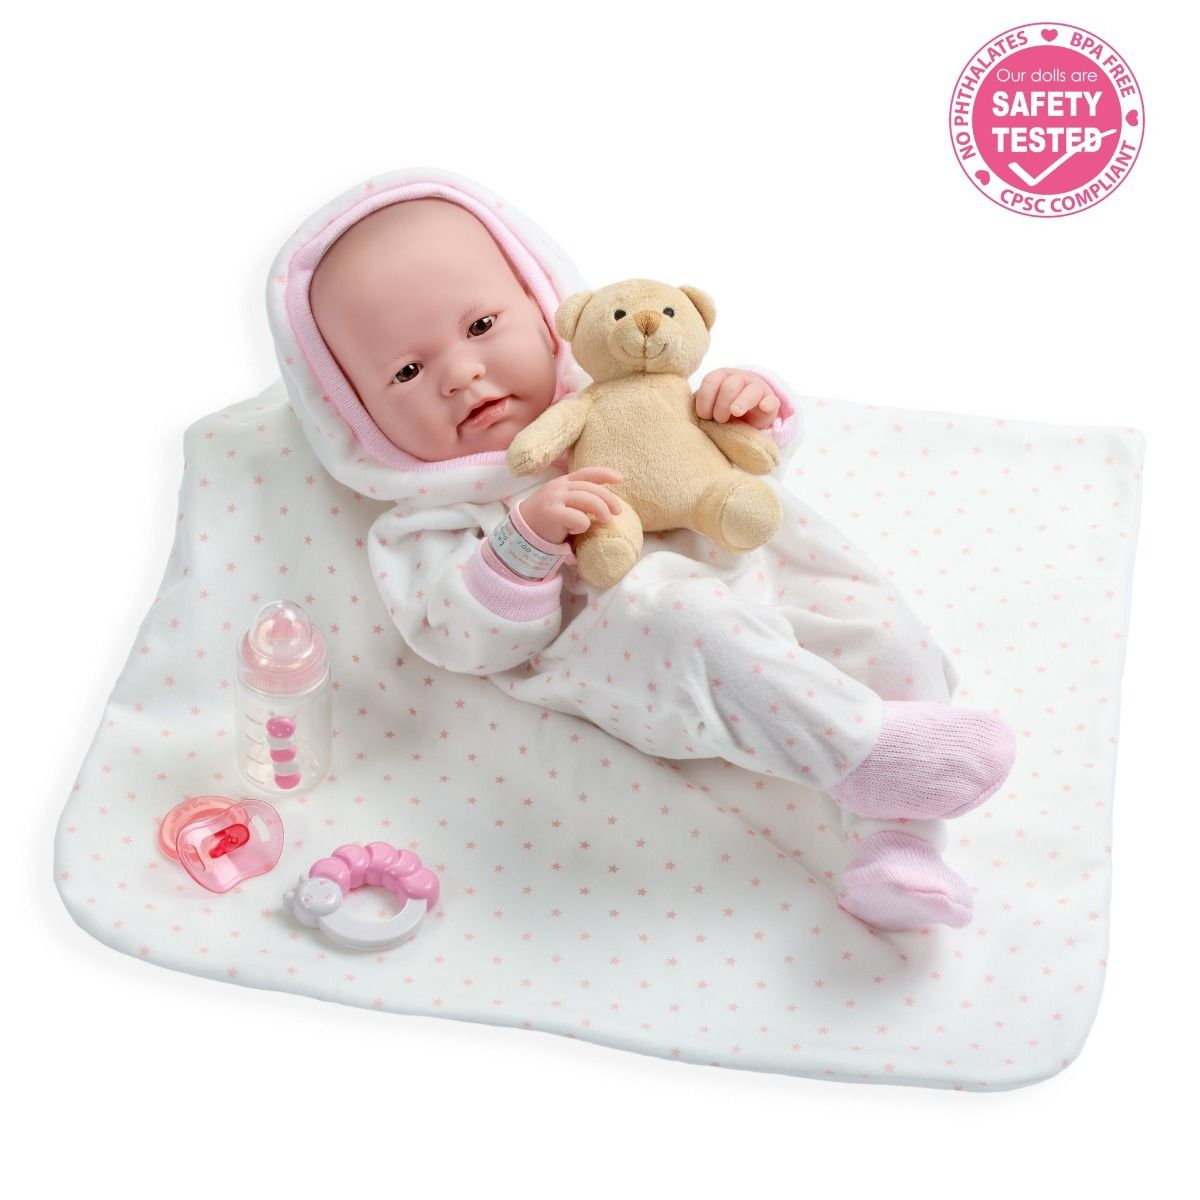 Кукла Berenguer Boutique Baby Doll in Pink in 9 Piece Deluxe Gift Set (Беринжер девочка в розовом 38 см с подарочным набором из 9 предметов)